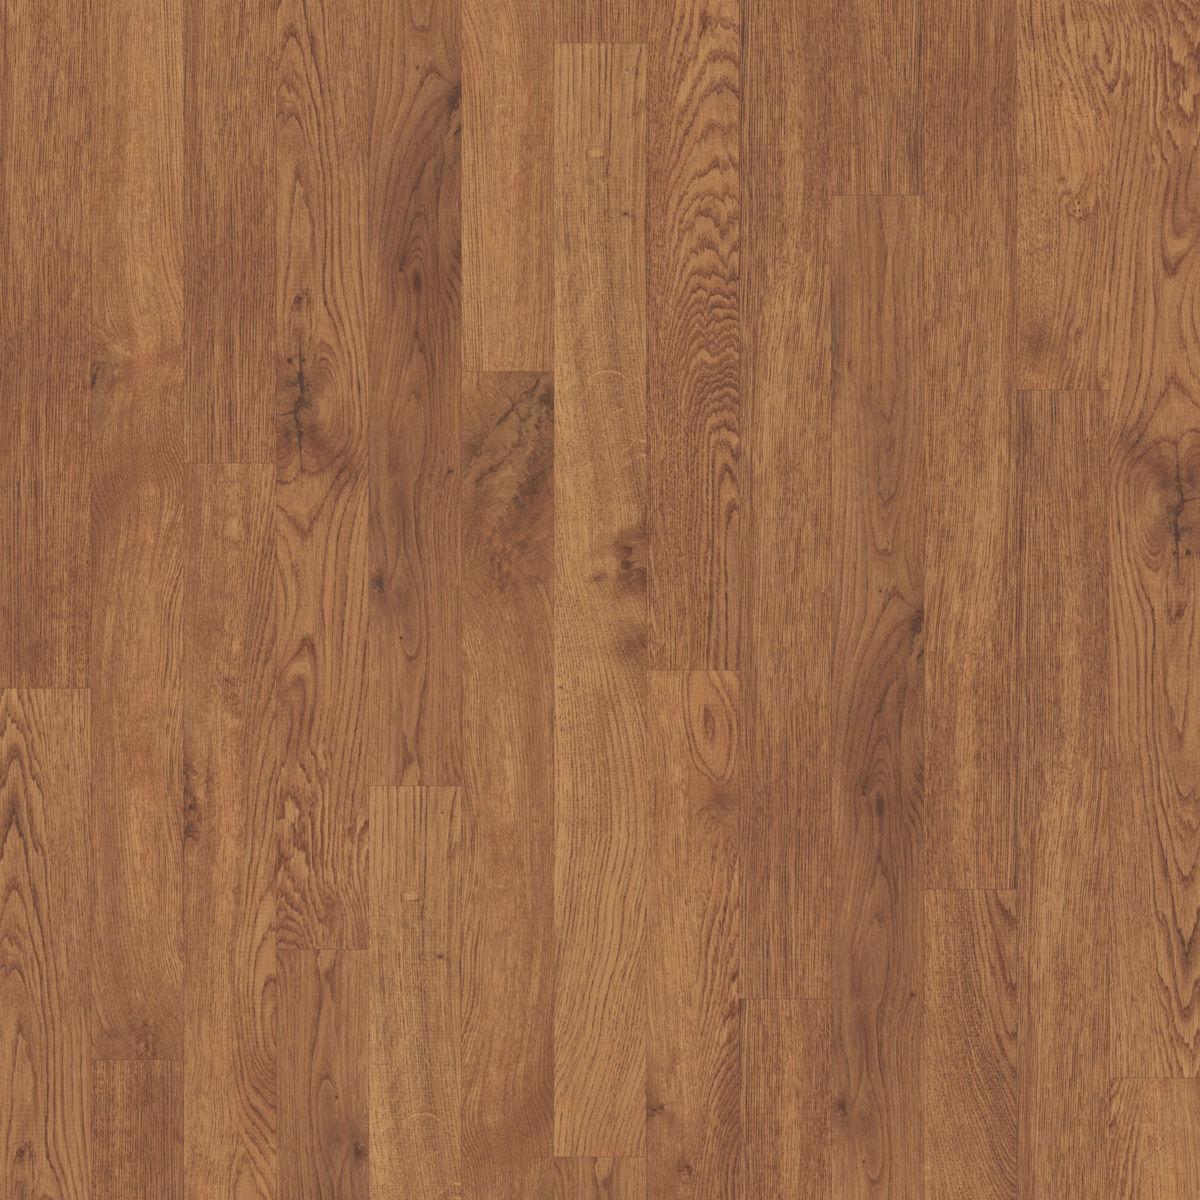 karndean da vinci lorenzo warm oak rp91 vinyl flooring. Black Bedroom Furniture Sets. Home Design Ideas